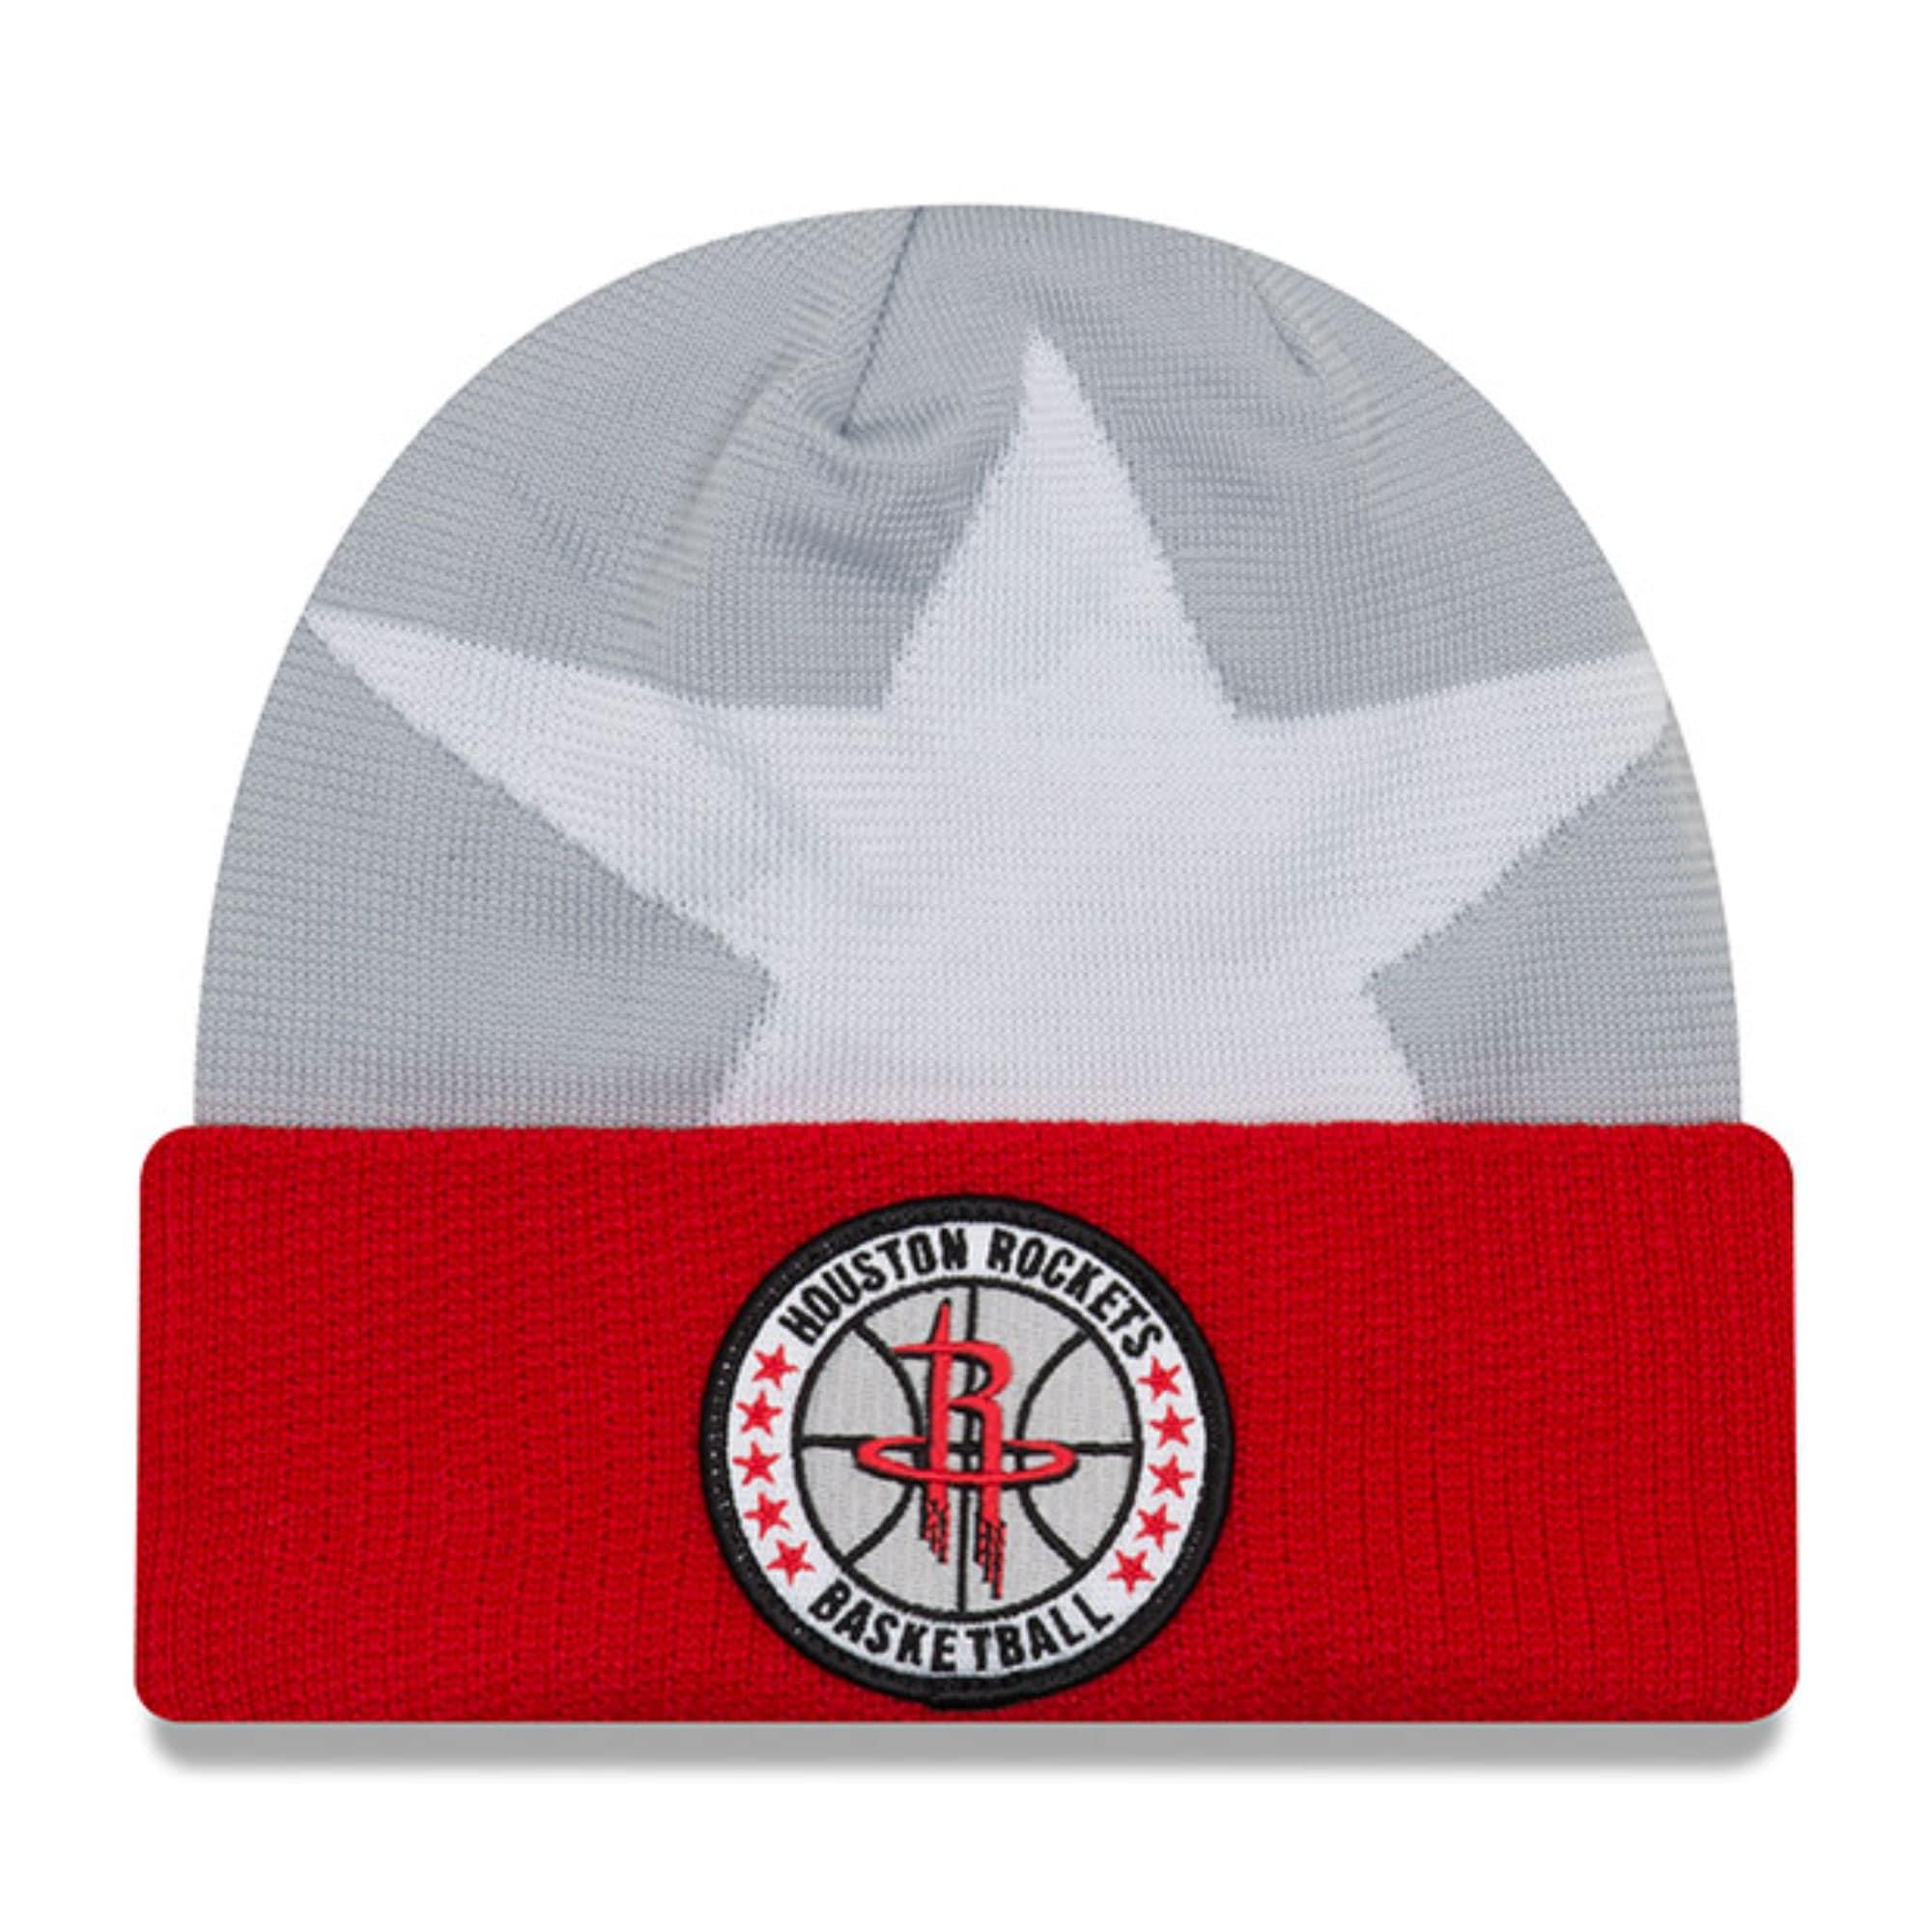 Houston Rockets New Era 2018 Tip Off Series Cuffed Knit Hat - Gray